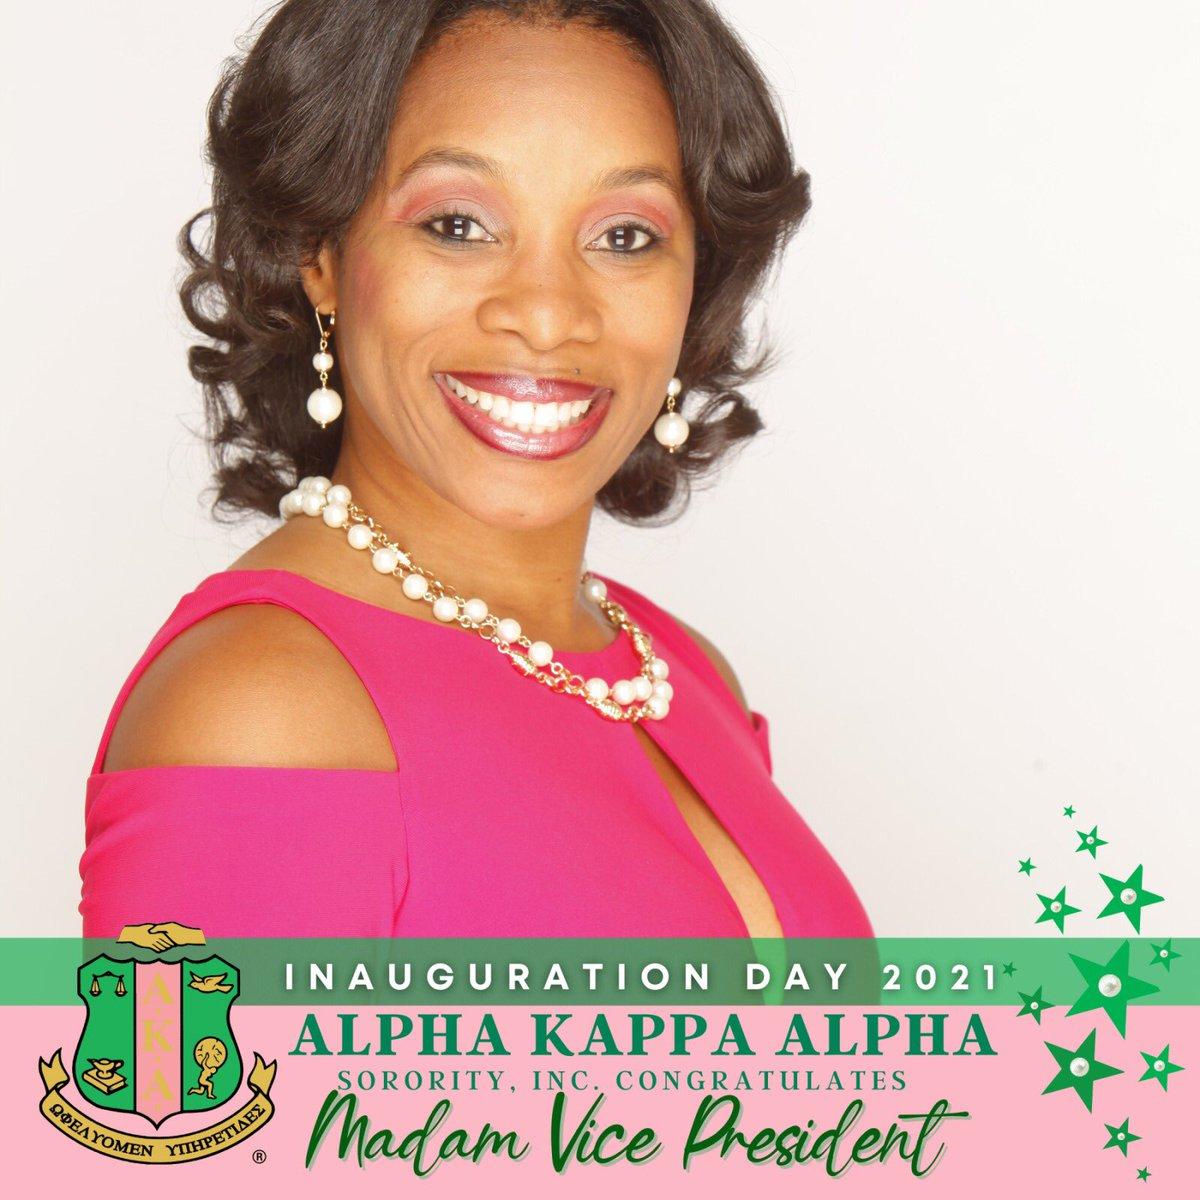 So excited to celebrate my Soror and Vice President of the United States of America, Kamala Harris! 💖💚🇺🇸🙏🏾#AKA1908 #AKAHistoryMaker #AKAMVP #FirstandFinest #ProudtobeanAKA